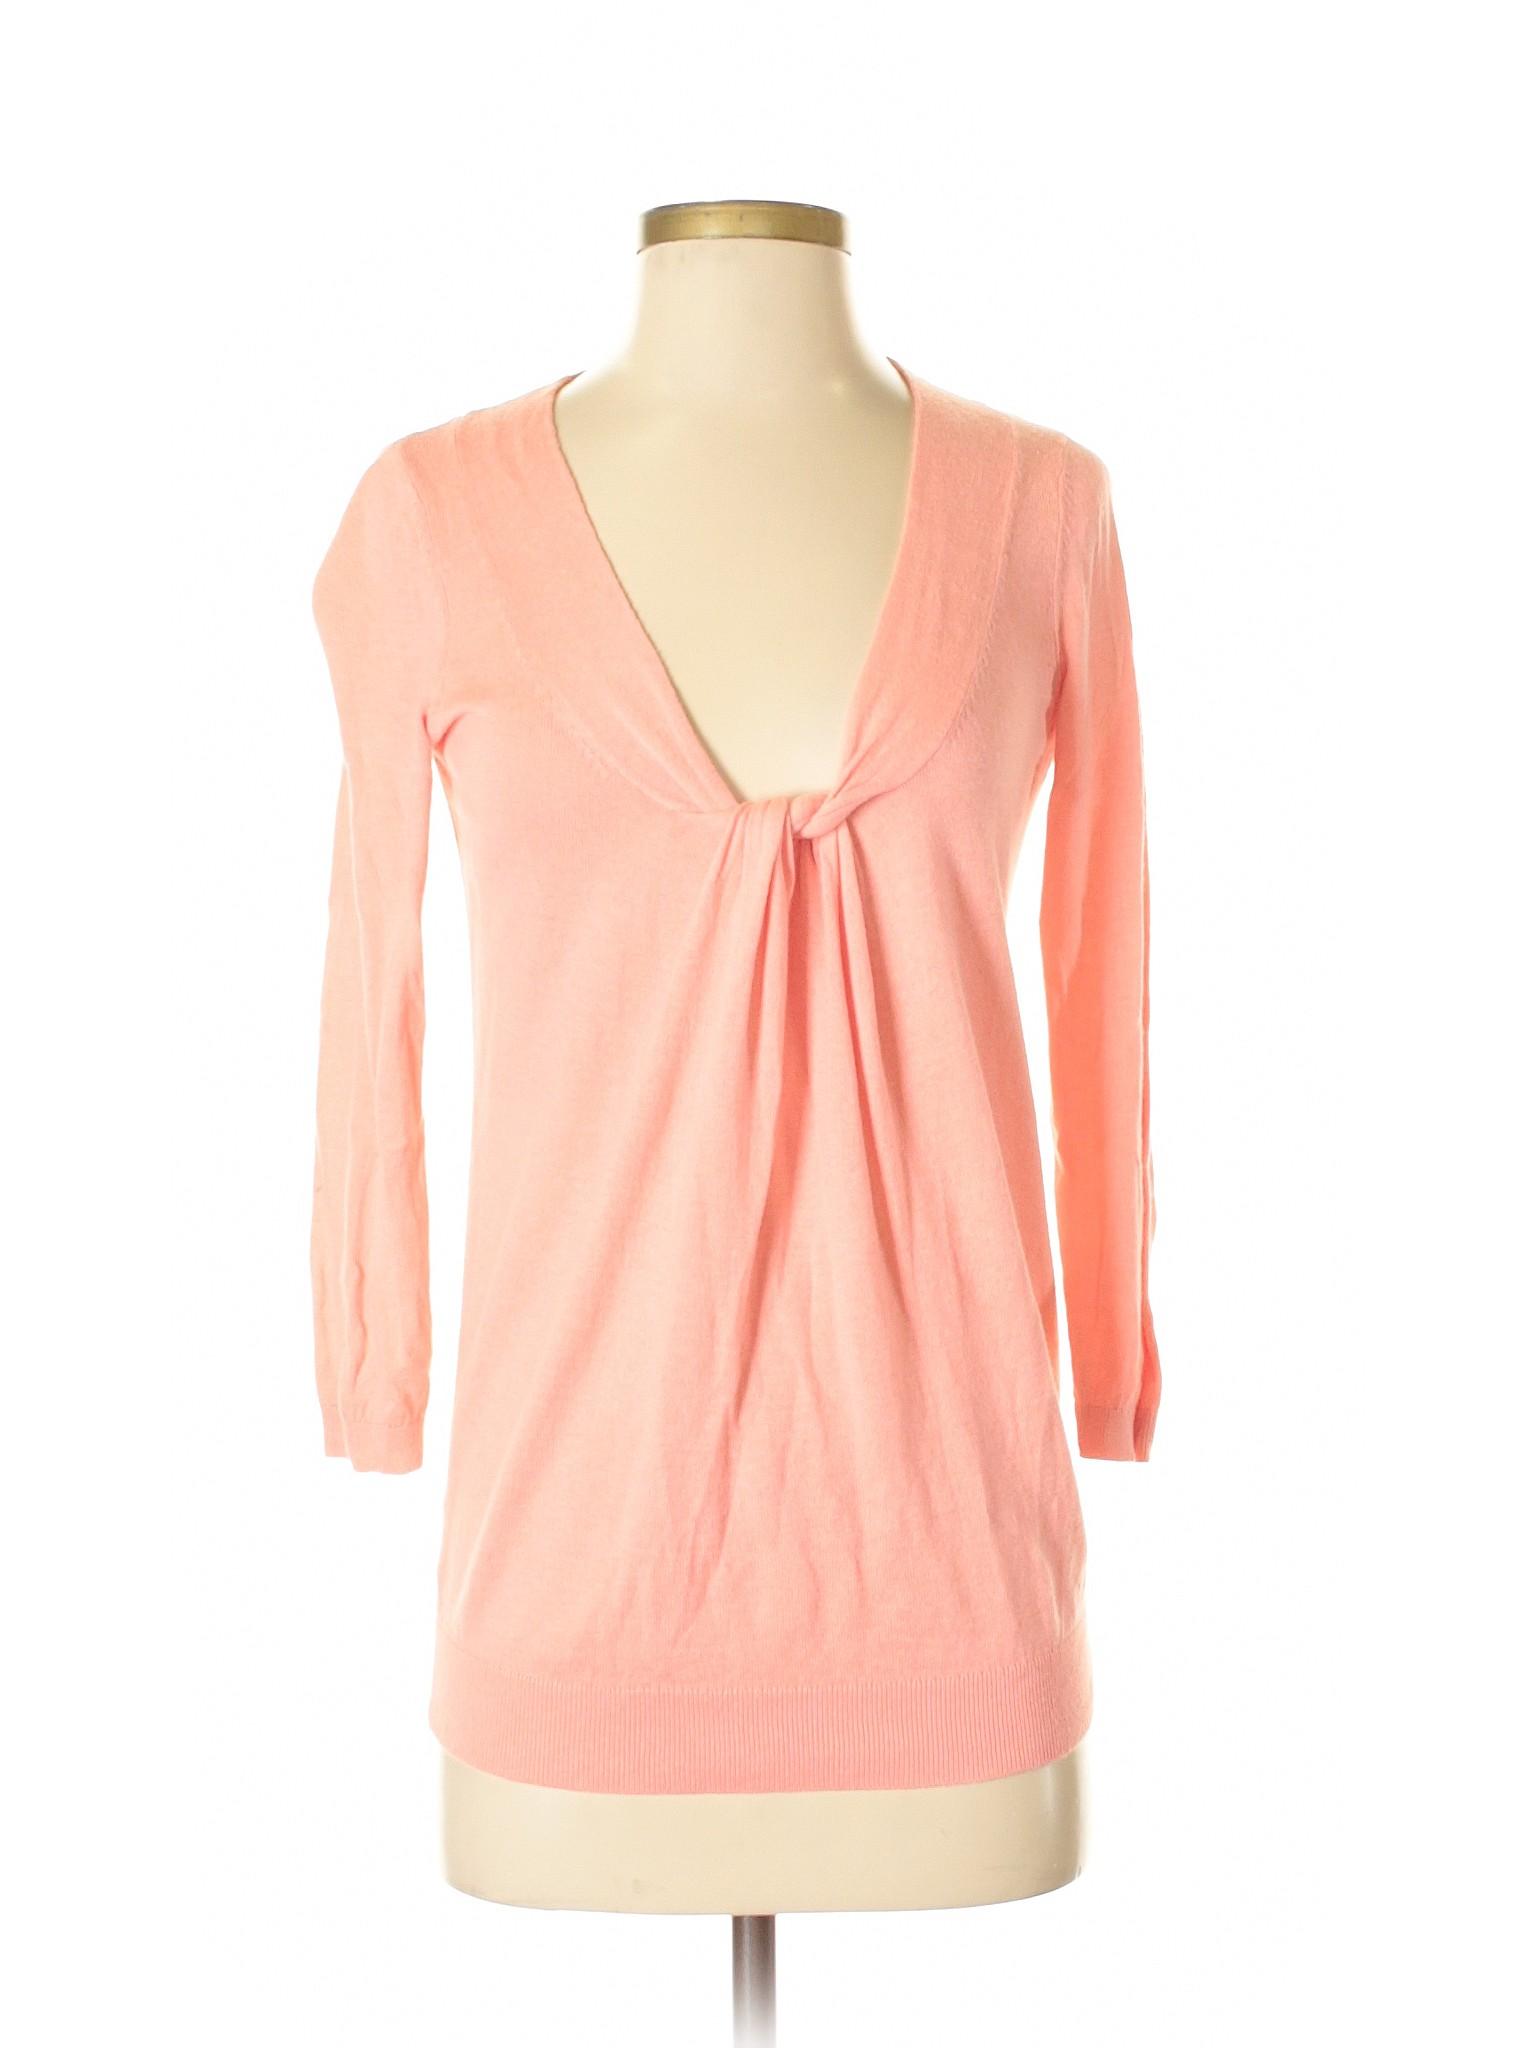 Boutique Pullover Sweater LOFT Taylor Ann rtqwcvaCr